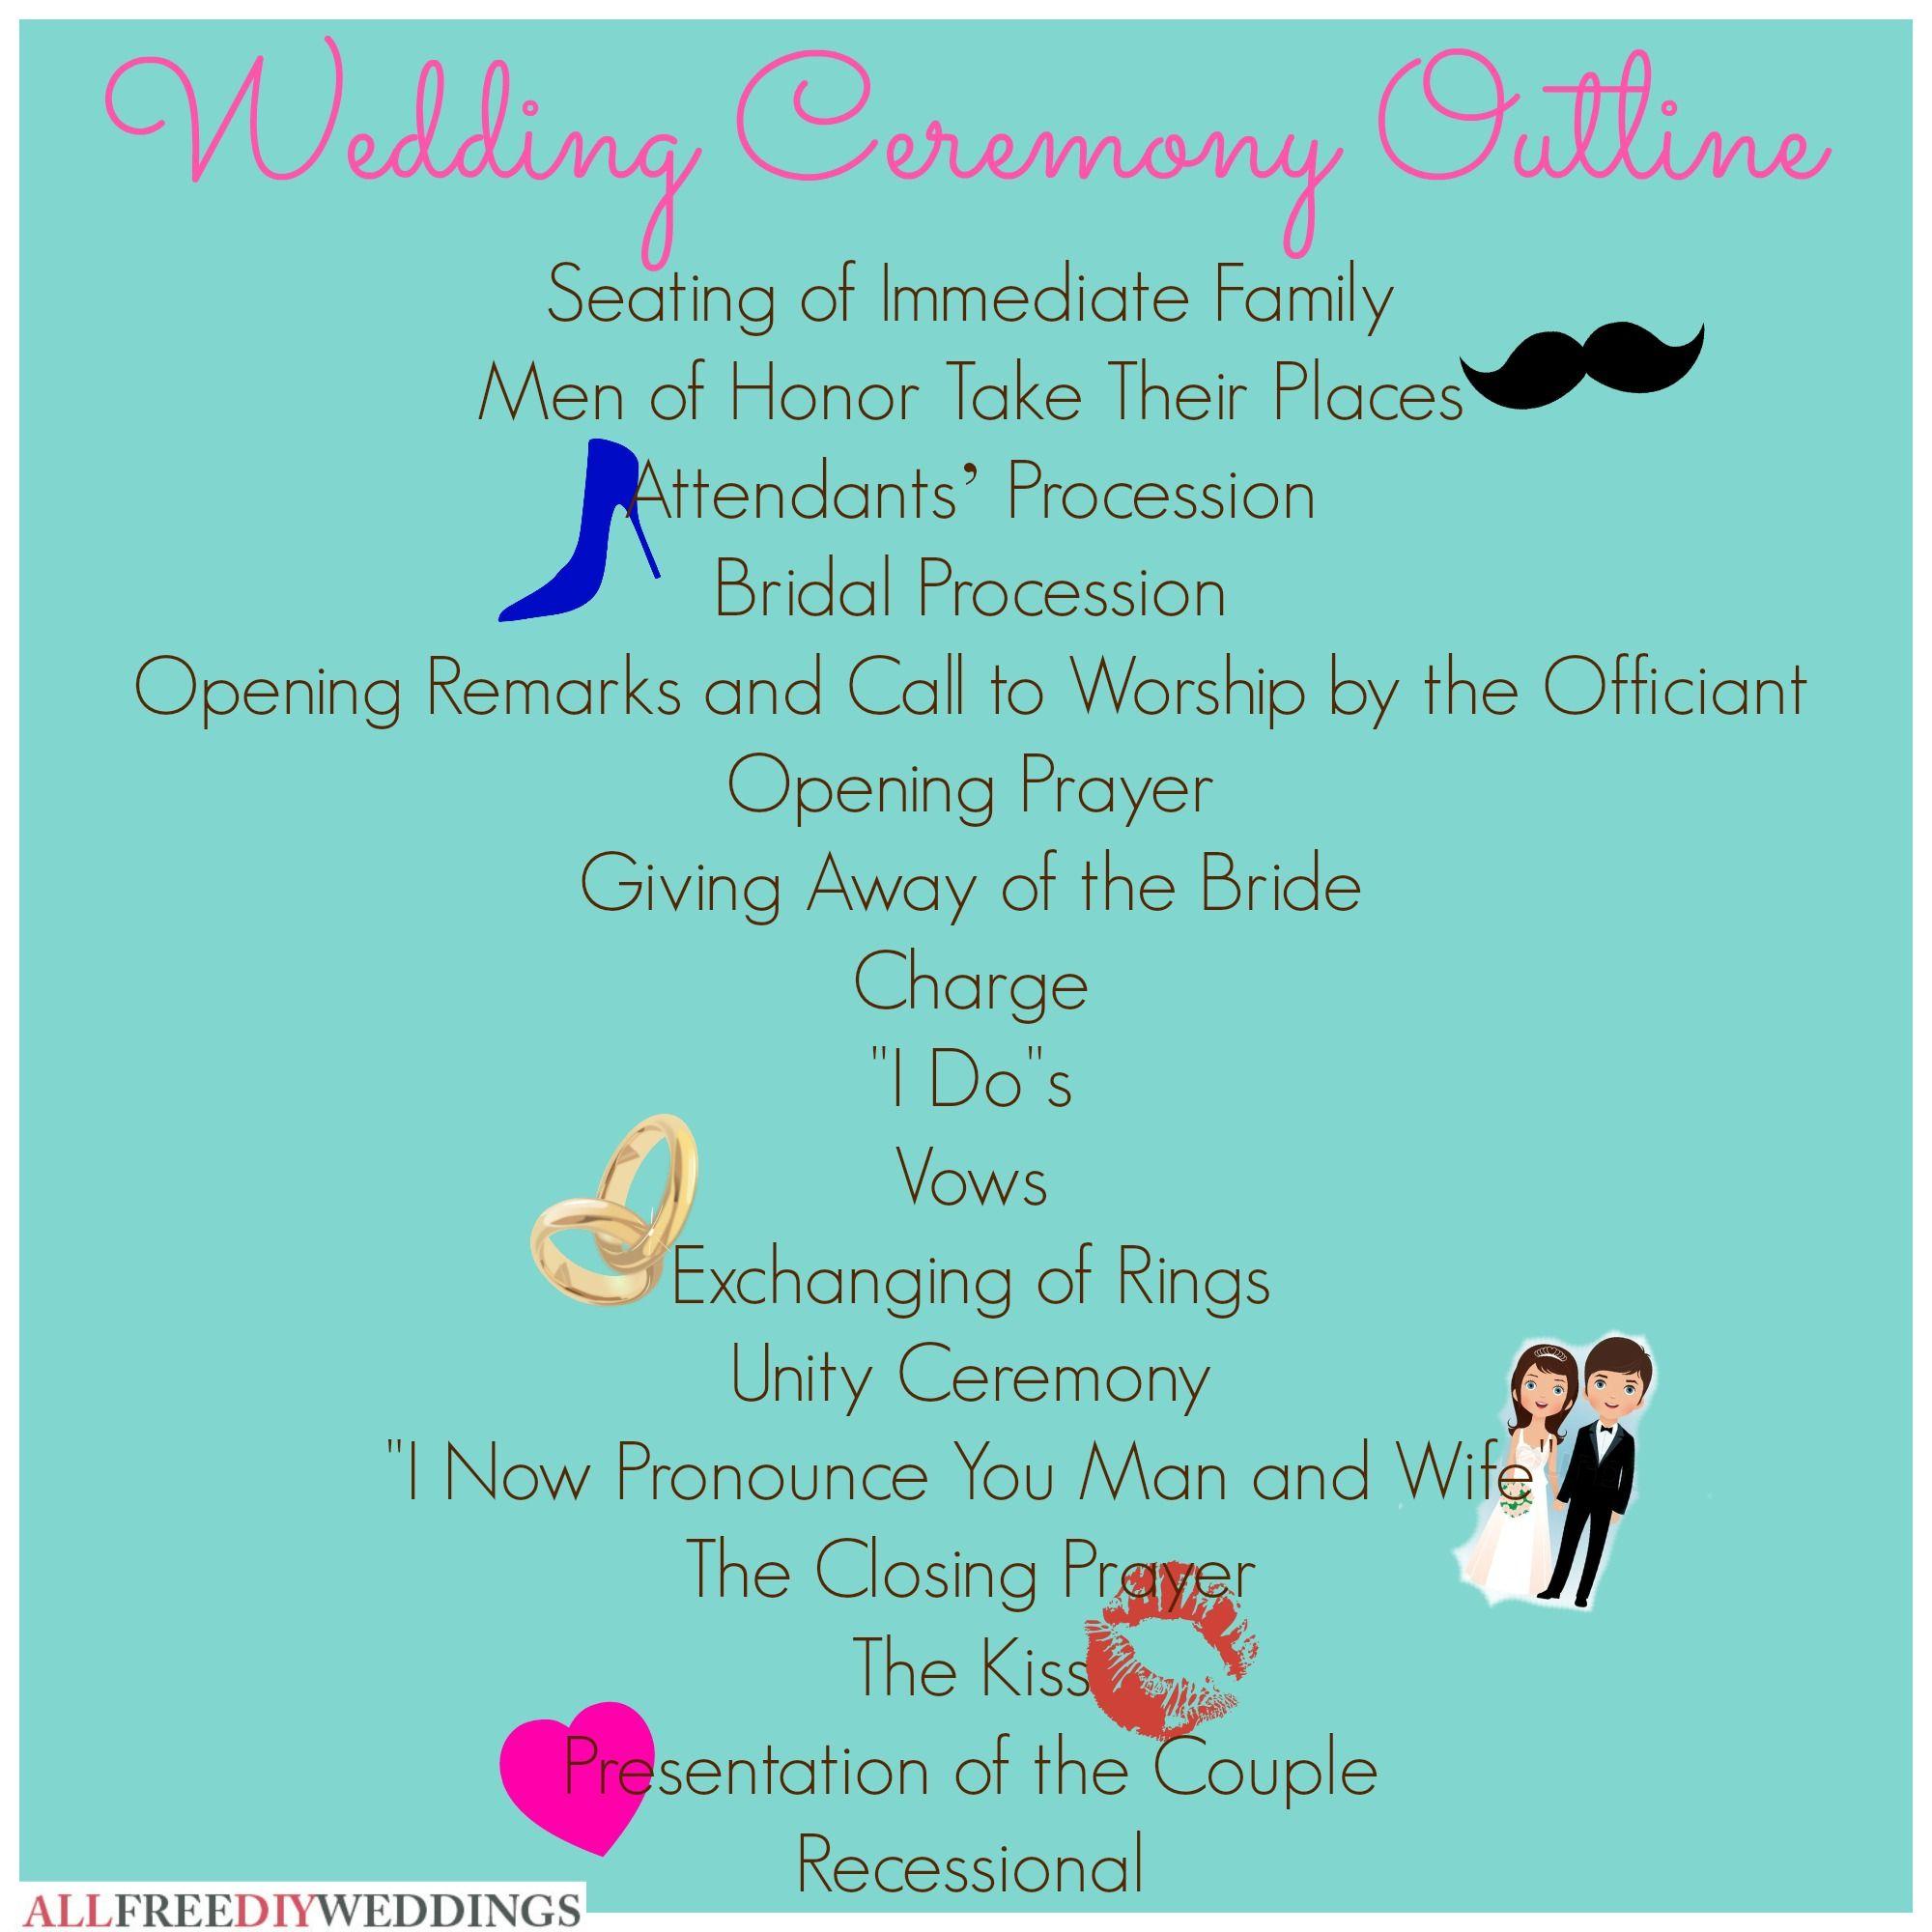 Wedding Ceremony Outline Wedding ceremony outline